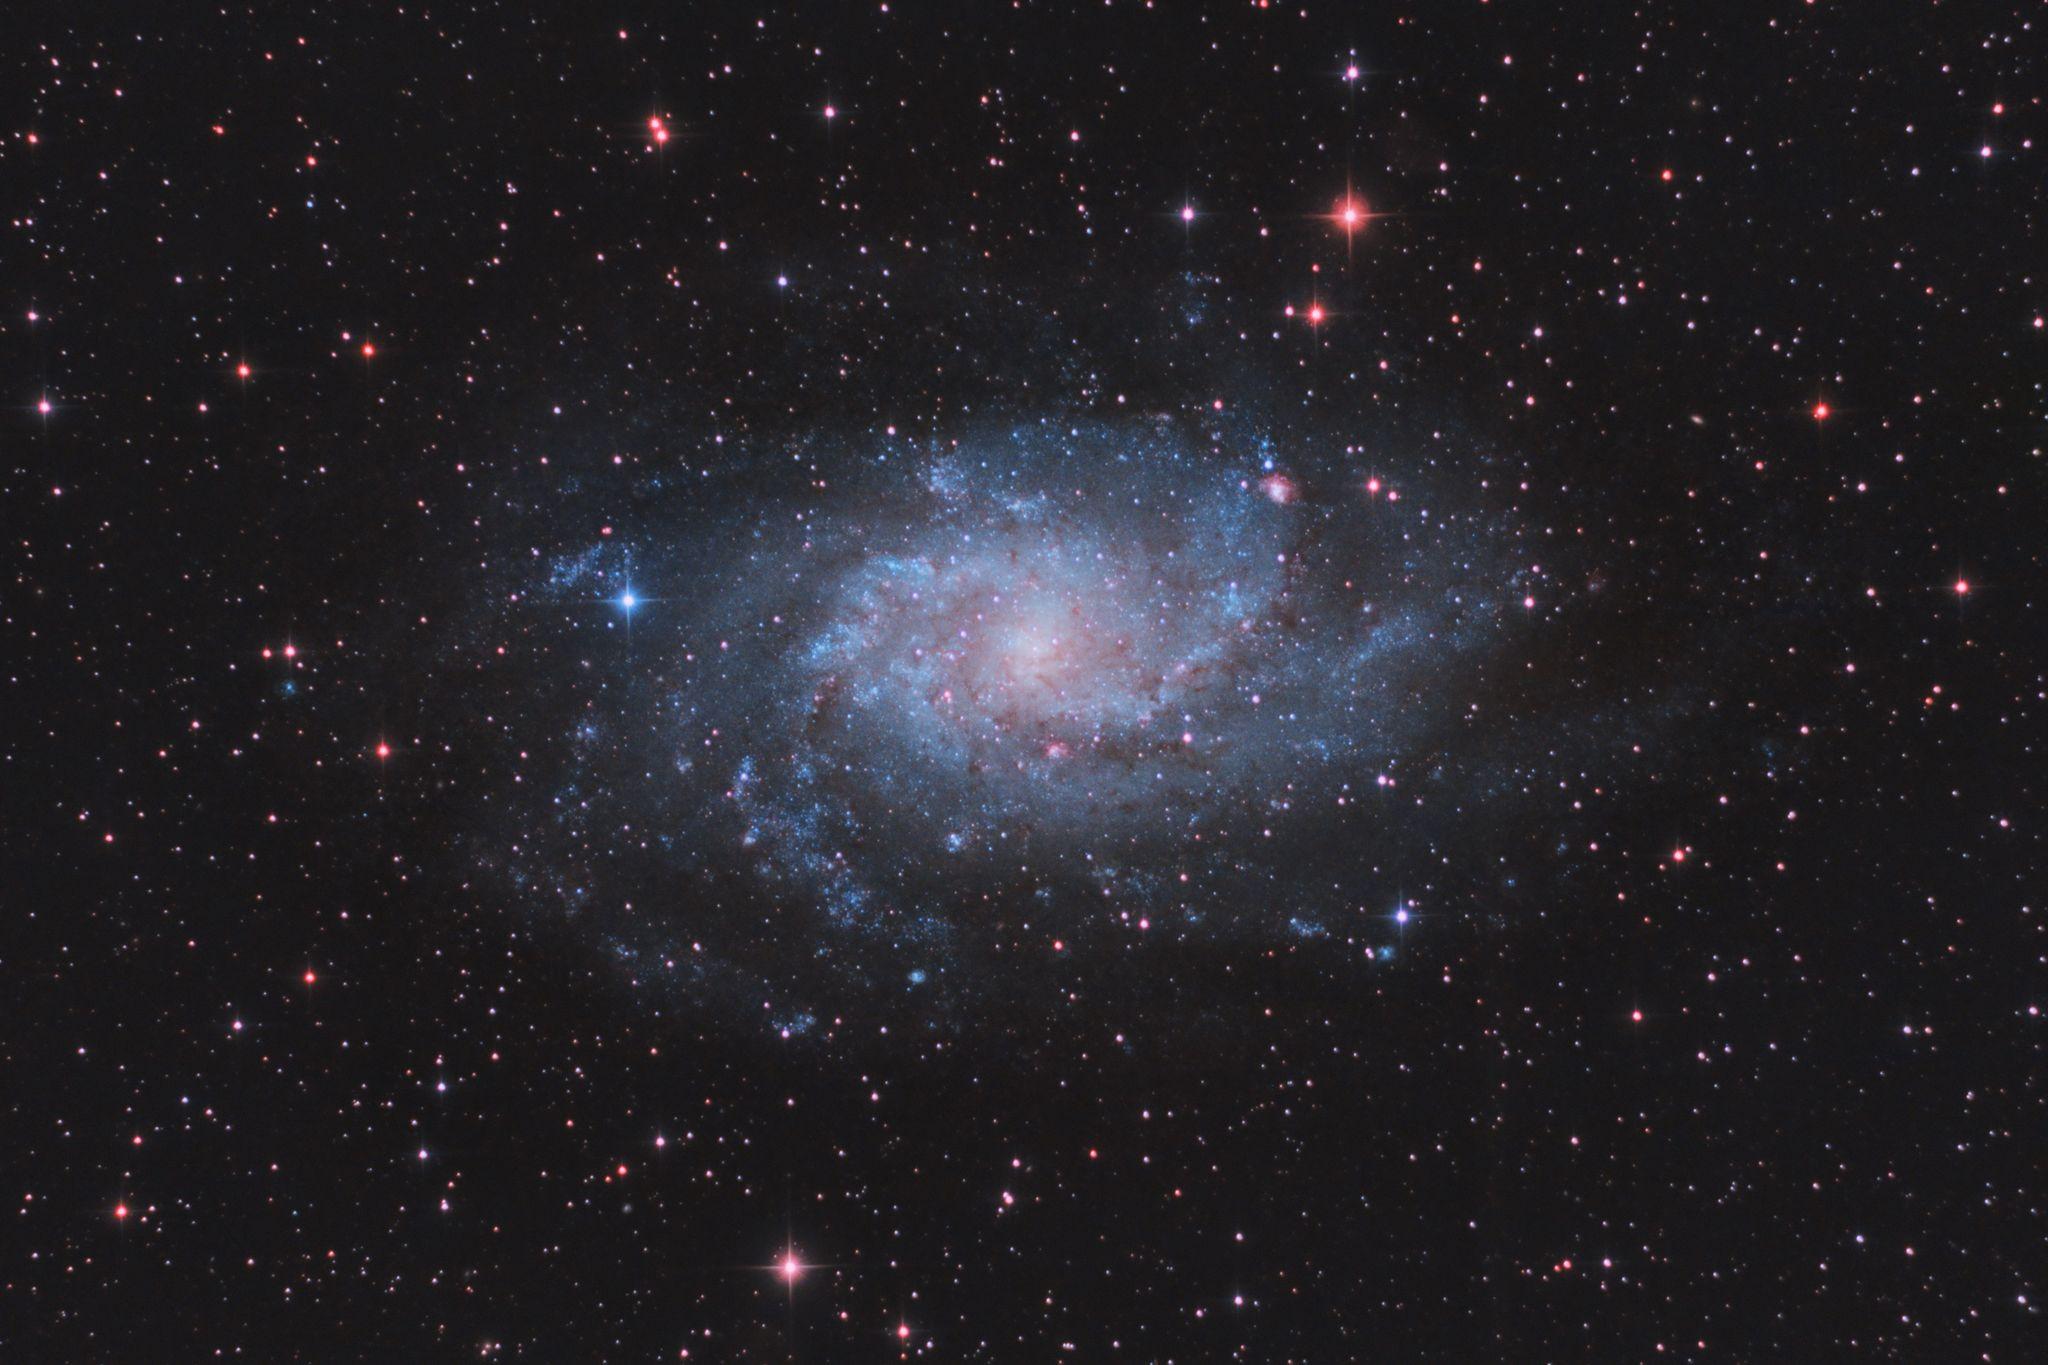 M33 The Triangulum Galaxy (